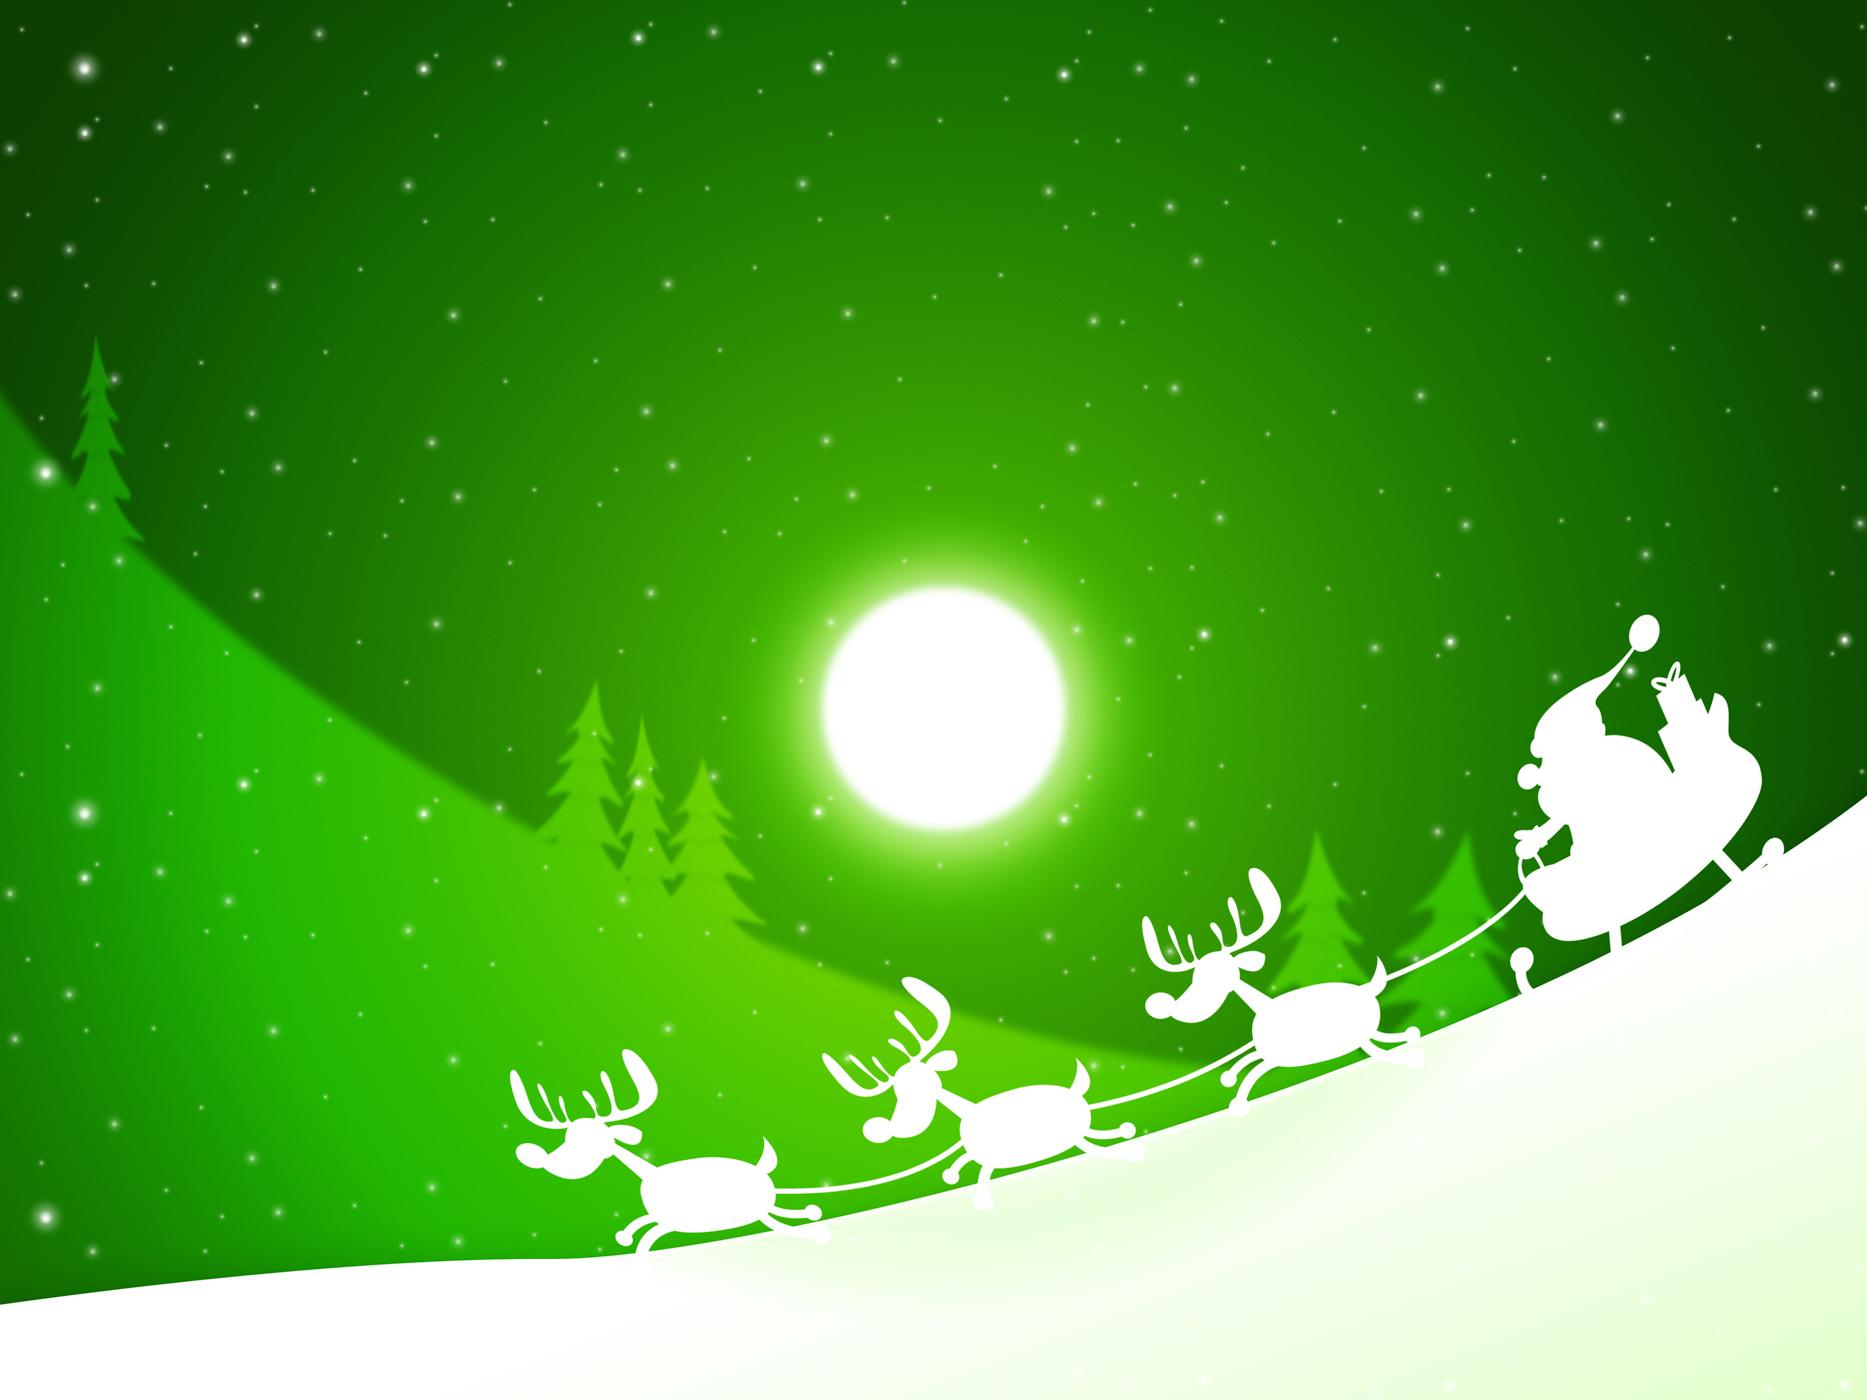 Moon santa indicates merry xmas and celebrate photo